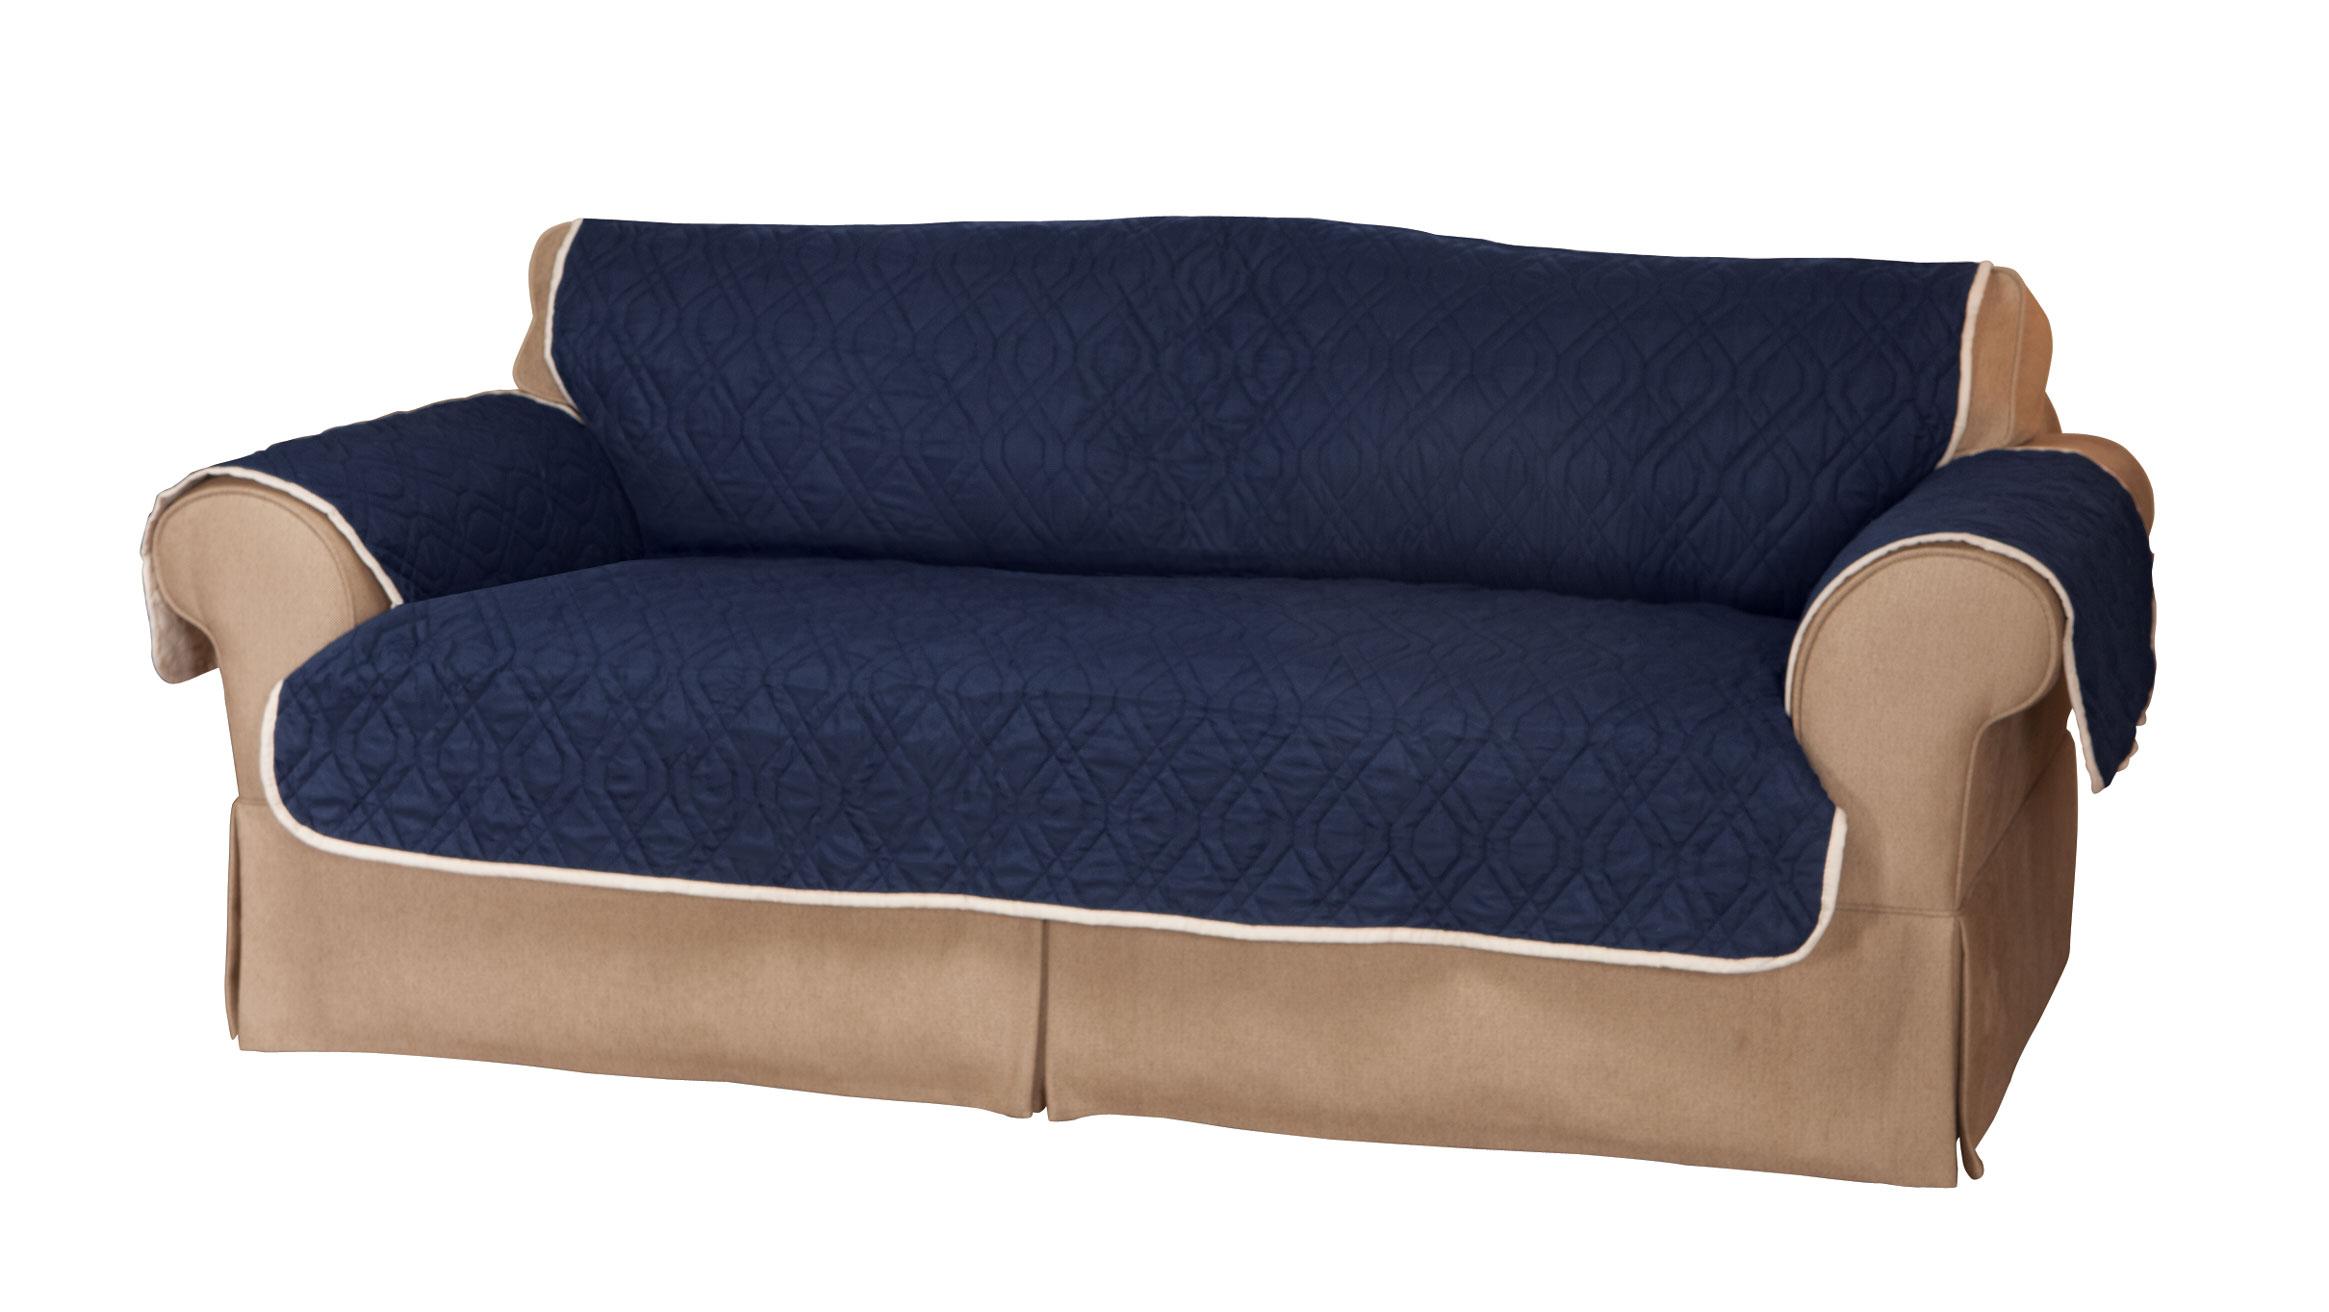 5 star reversible waterproof extra long sofa protector ebay for Reversible waterproof furniture covers